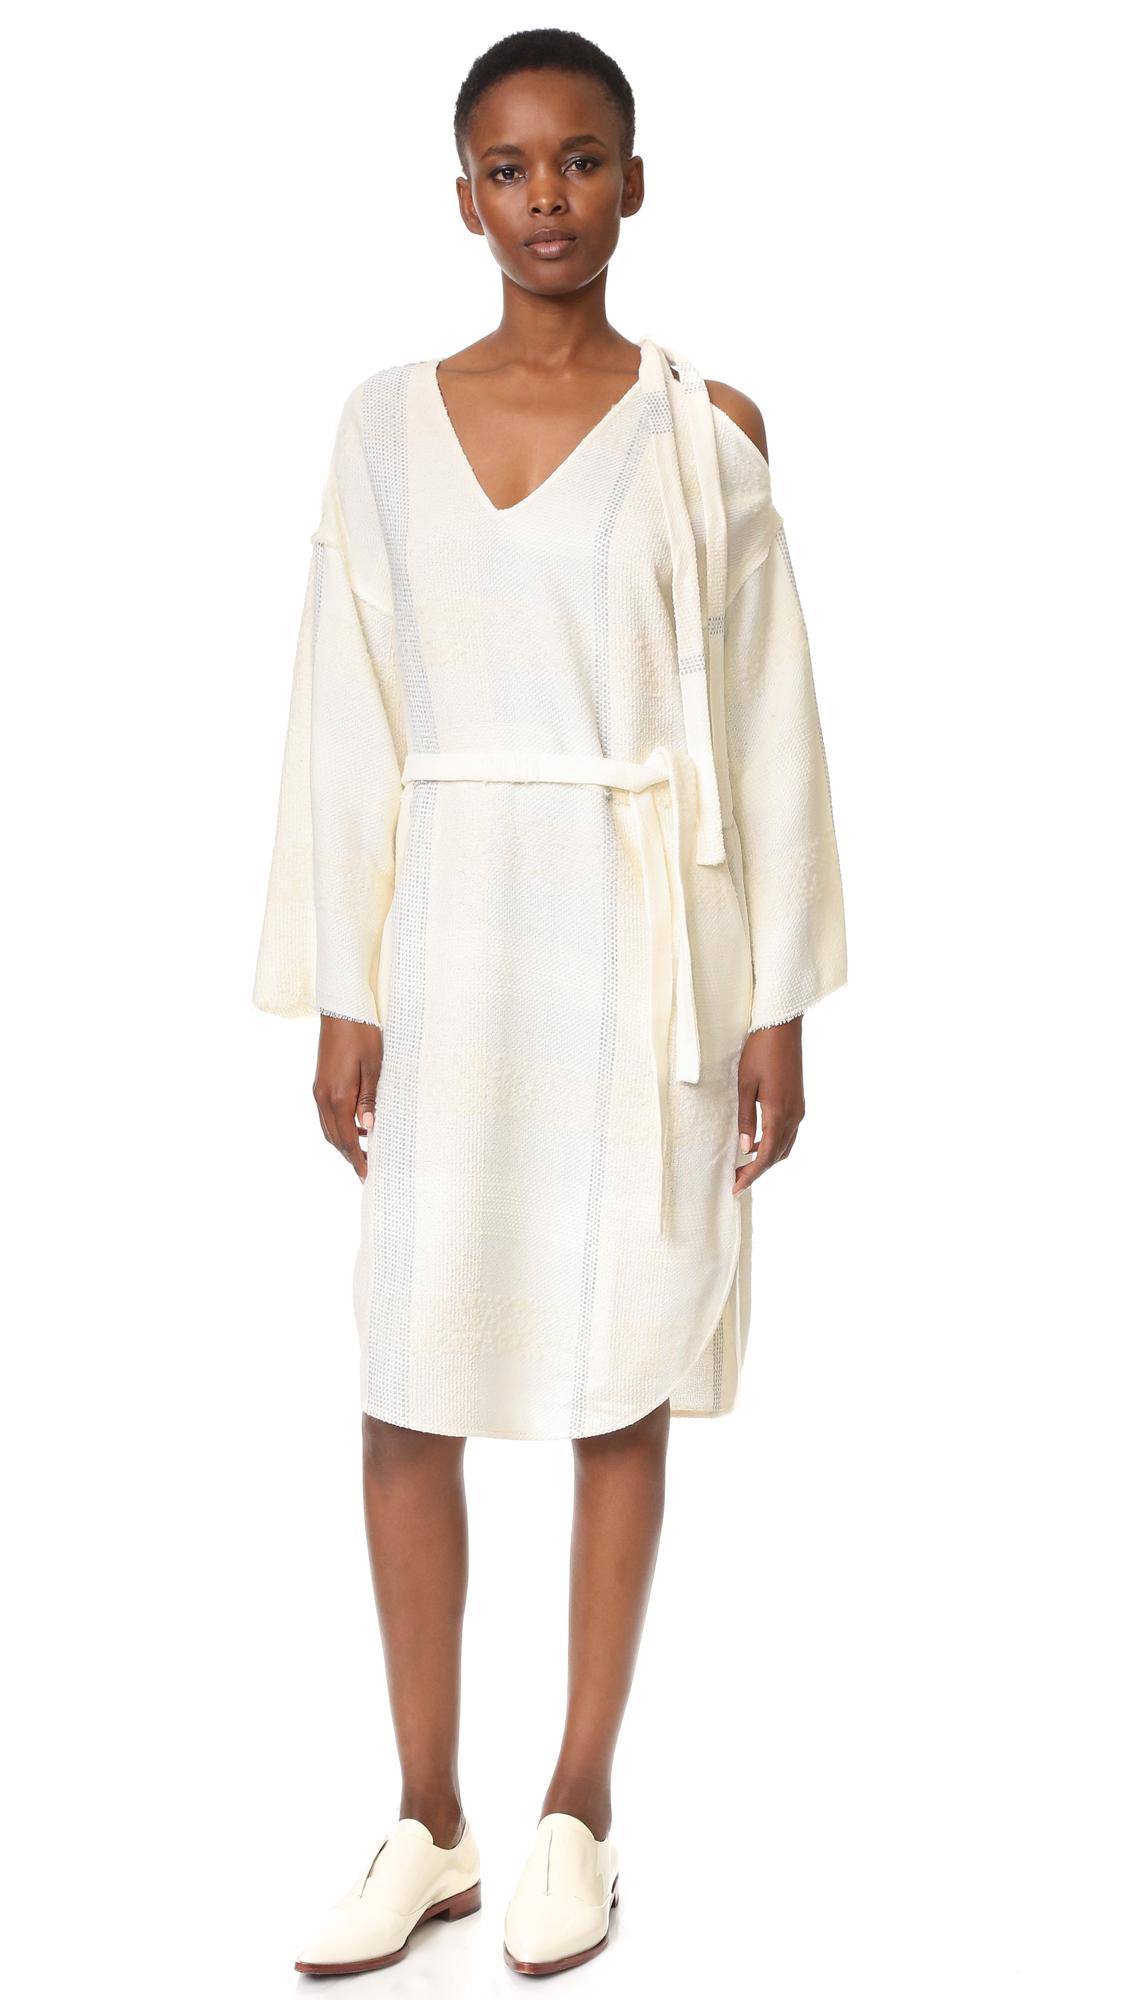 Aeron Knit Tie Dress - Cream at Shopbop